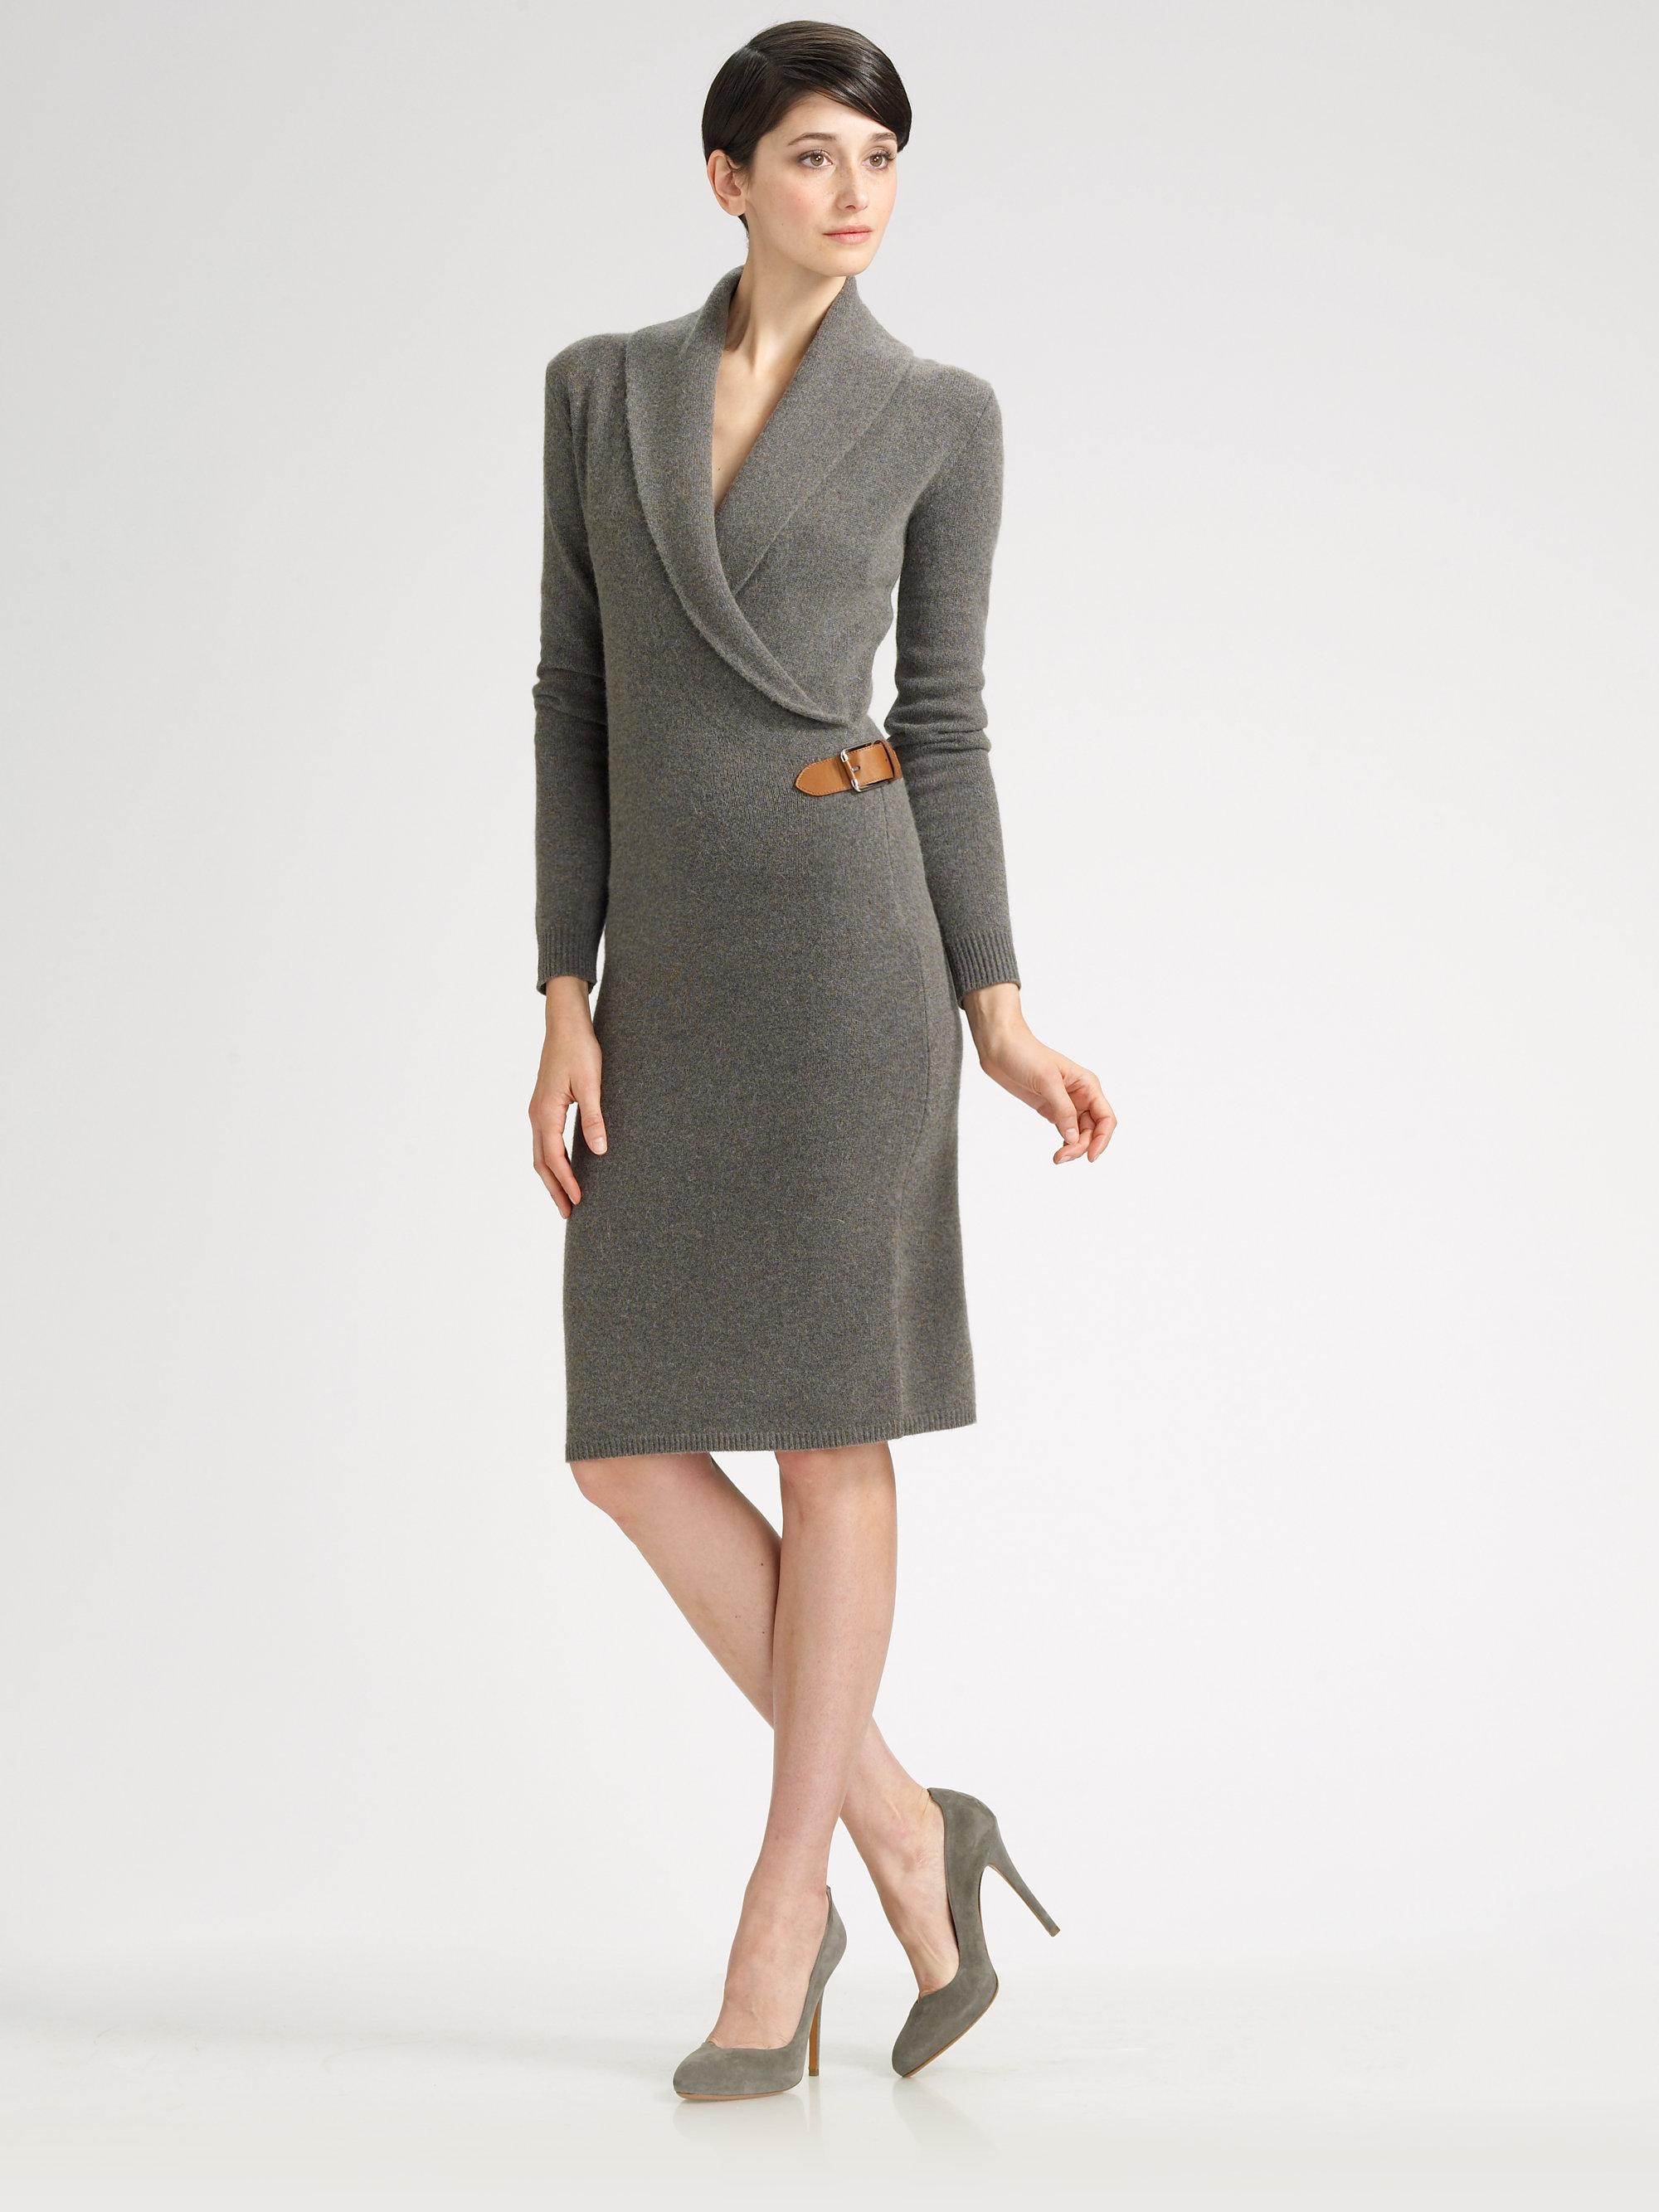 Lyst Ralph Lauren Black Label Harper Stretch Wool Dress